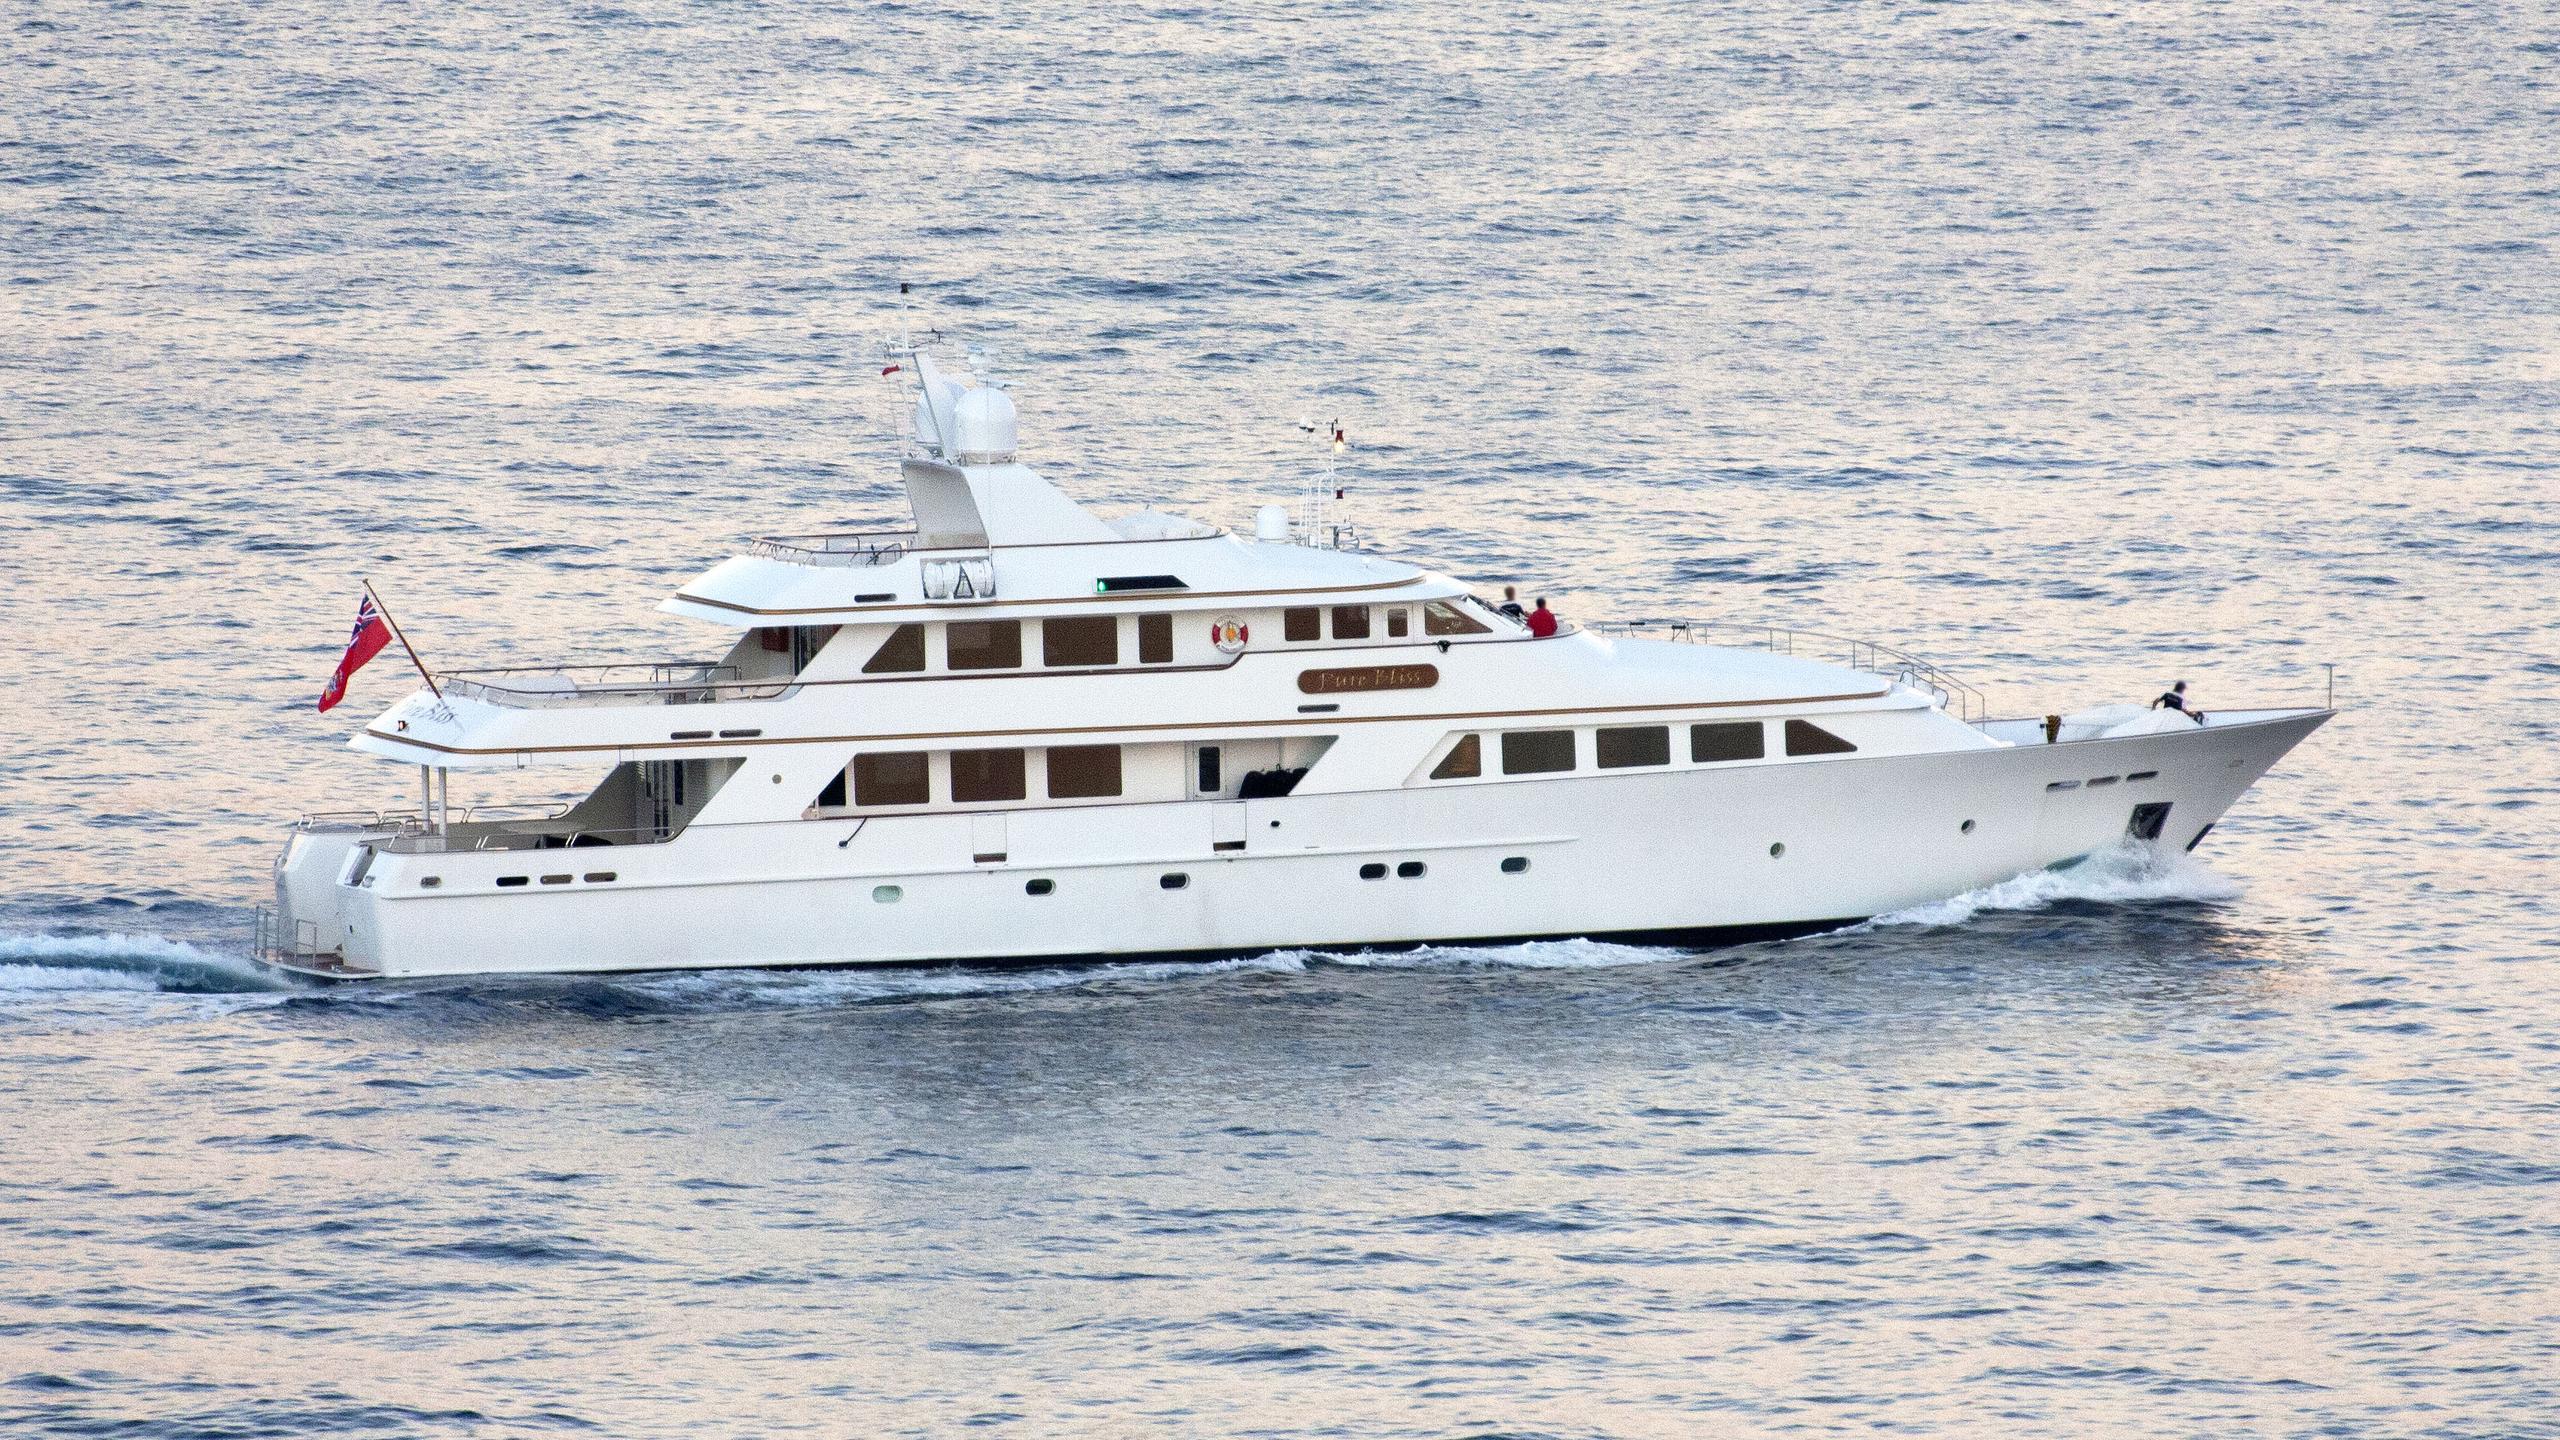 lady-j-motor-yacht-palmer-johnson-1997-43m-cruising